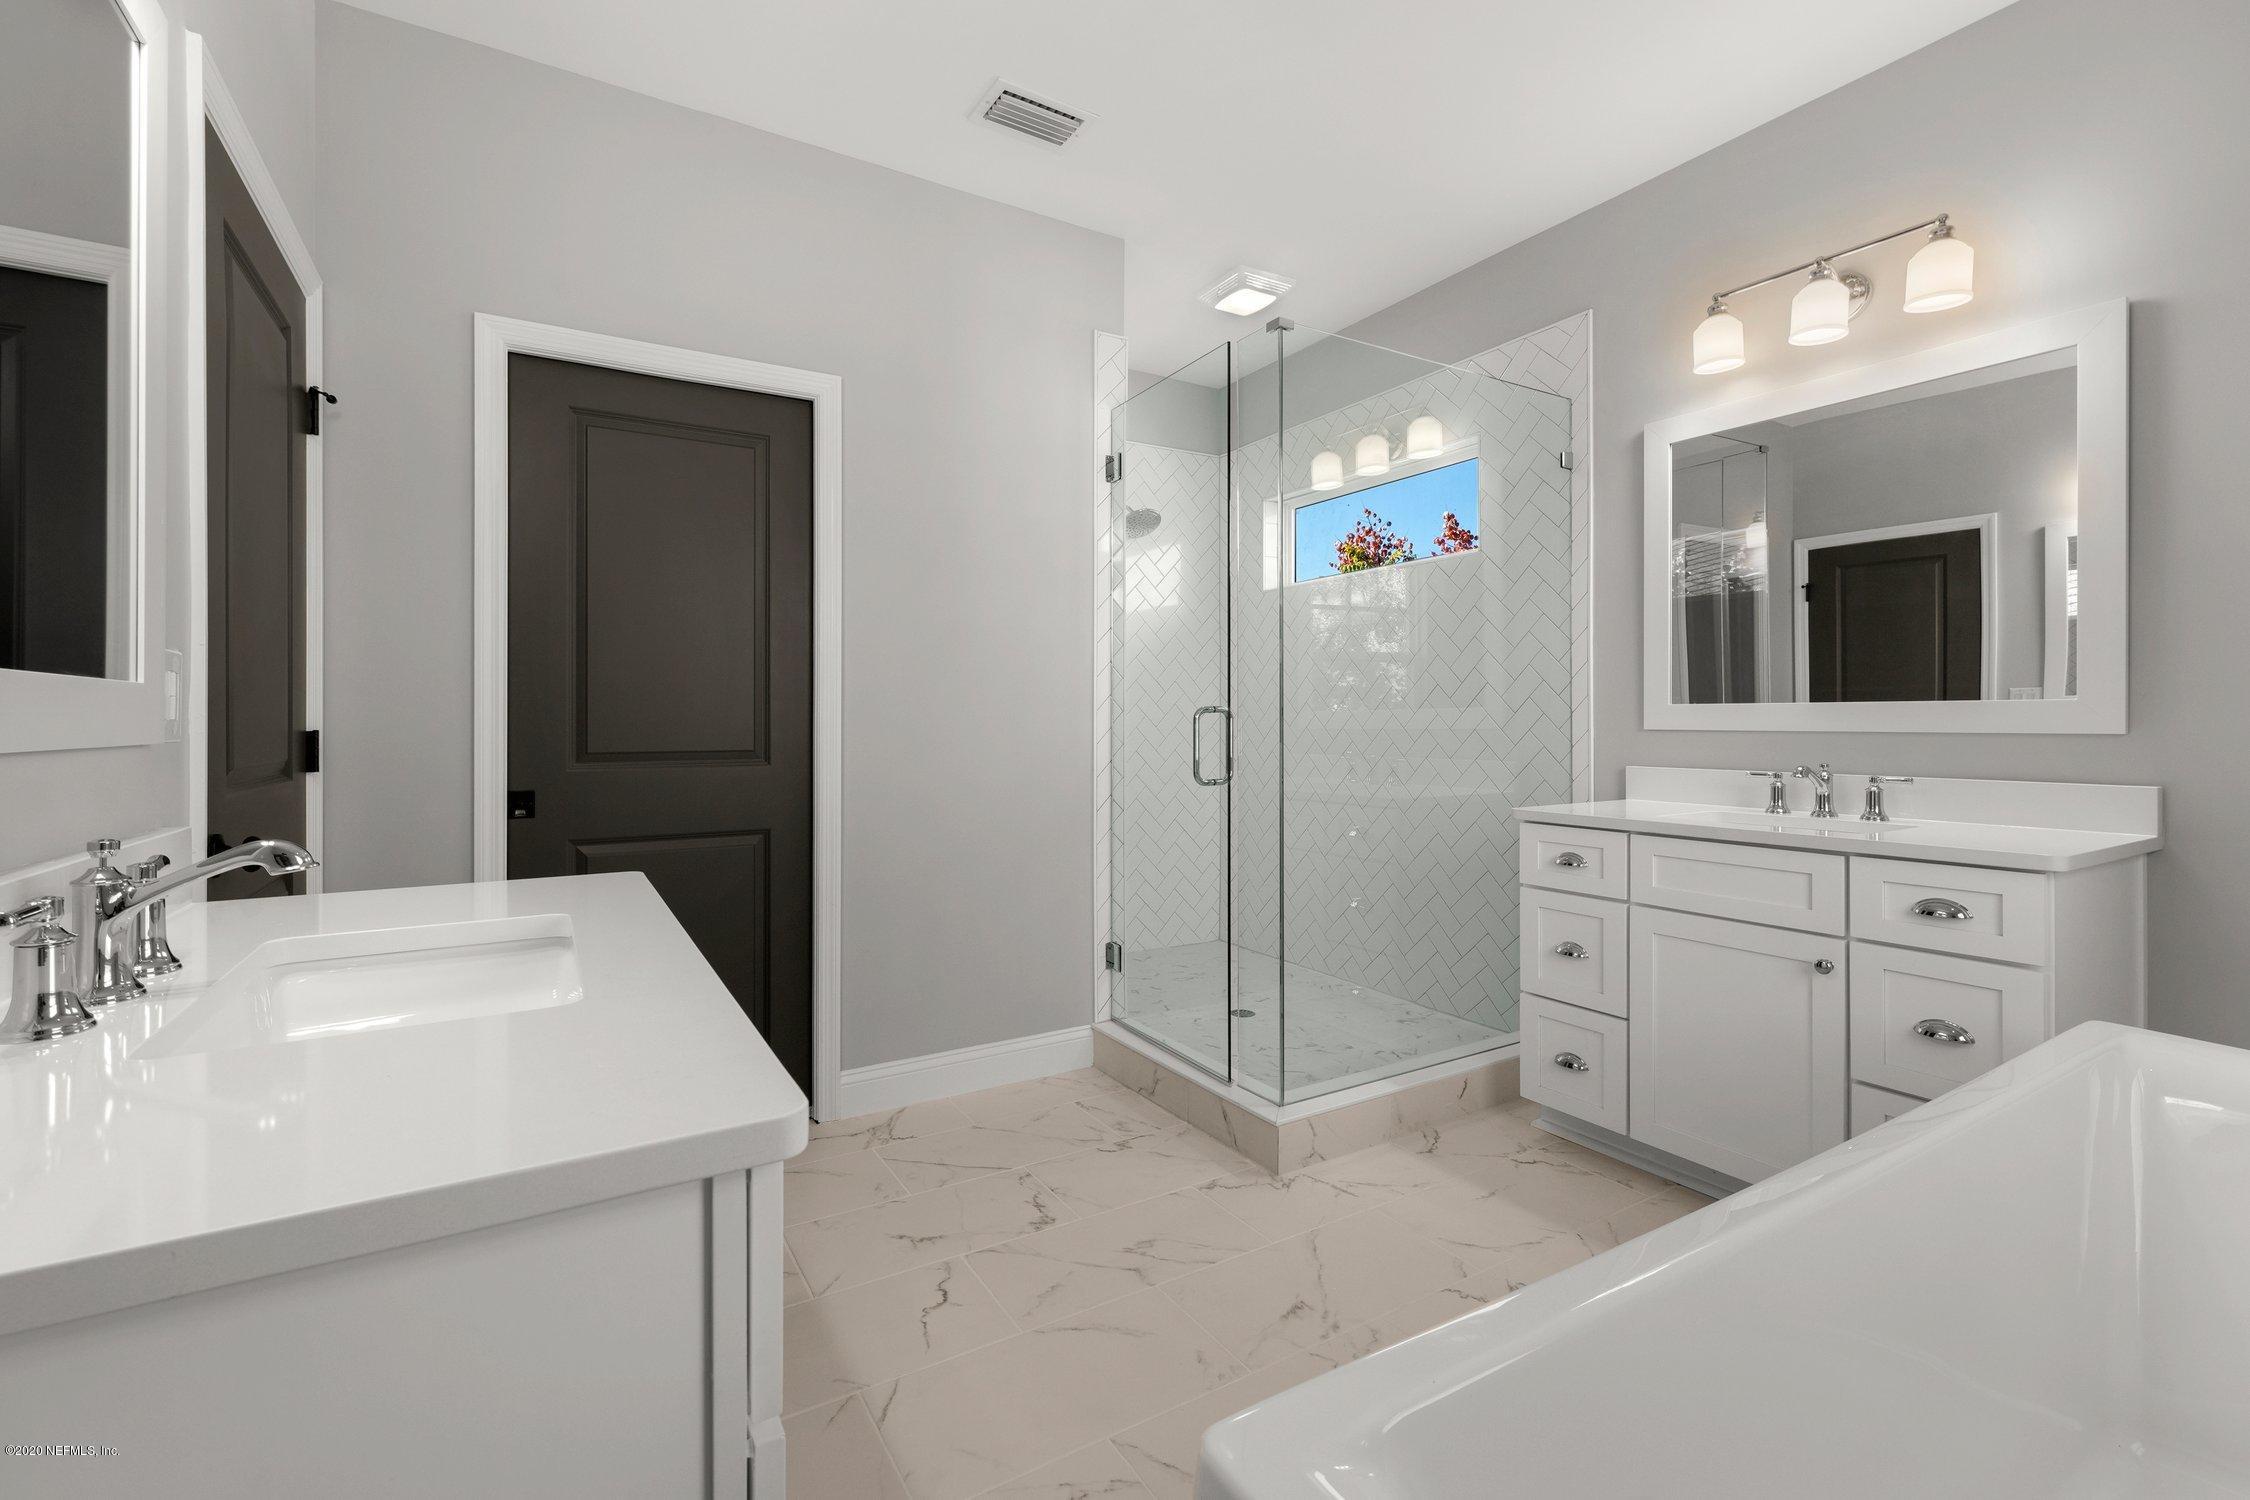 2519 POST, JACKSONVILLE, FLORIDA 32204, 4 Bedrooms Bedrooms, ,3 BathroomsBathrooms,Residential,For sale,POST,1082044